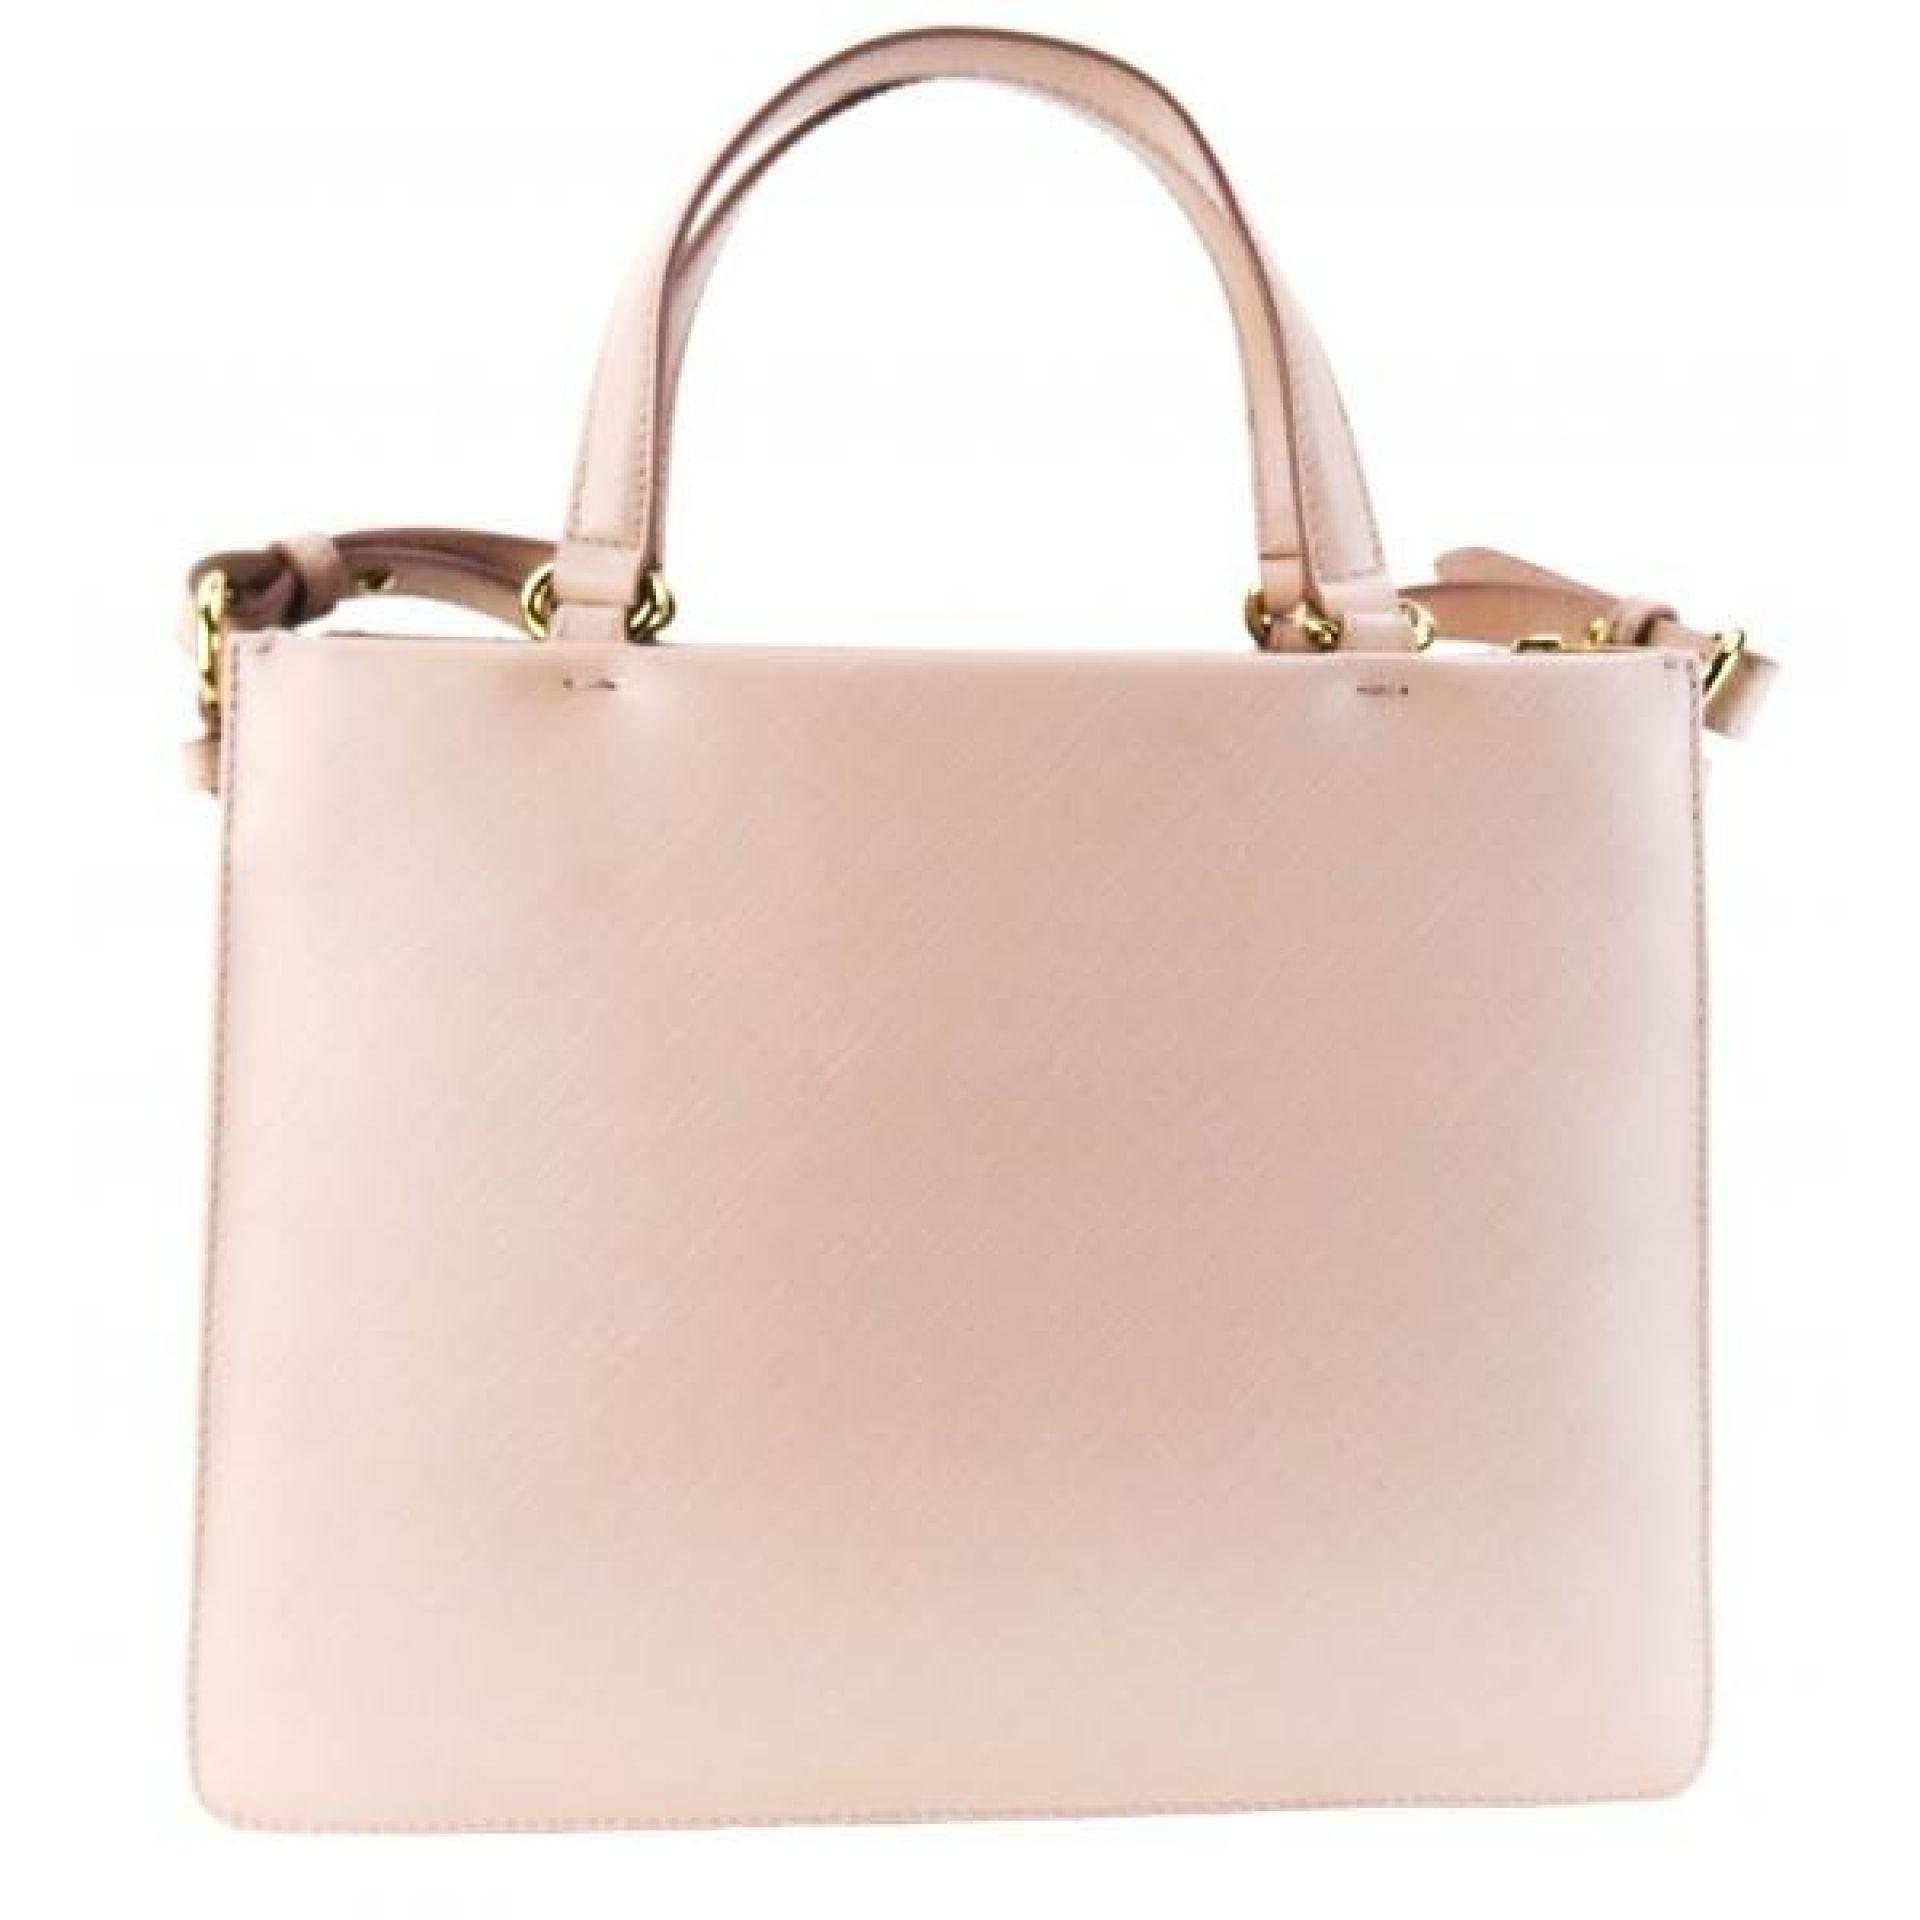 Salvatore Ferragamo Light Pink Saffiano Leather Tracy Classic Vara Bow Satchel B